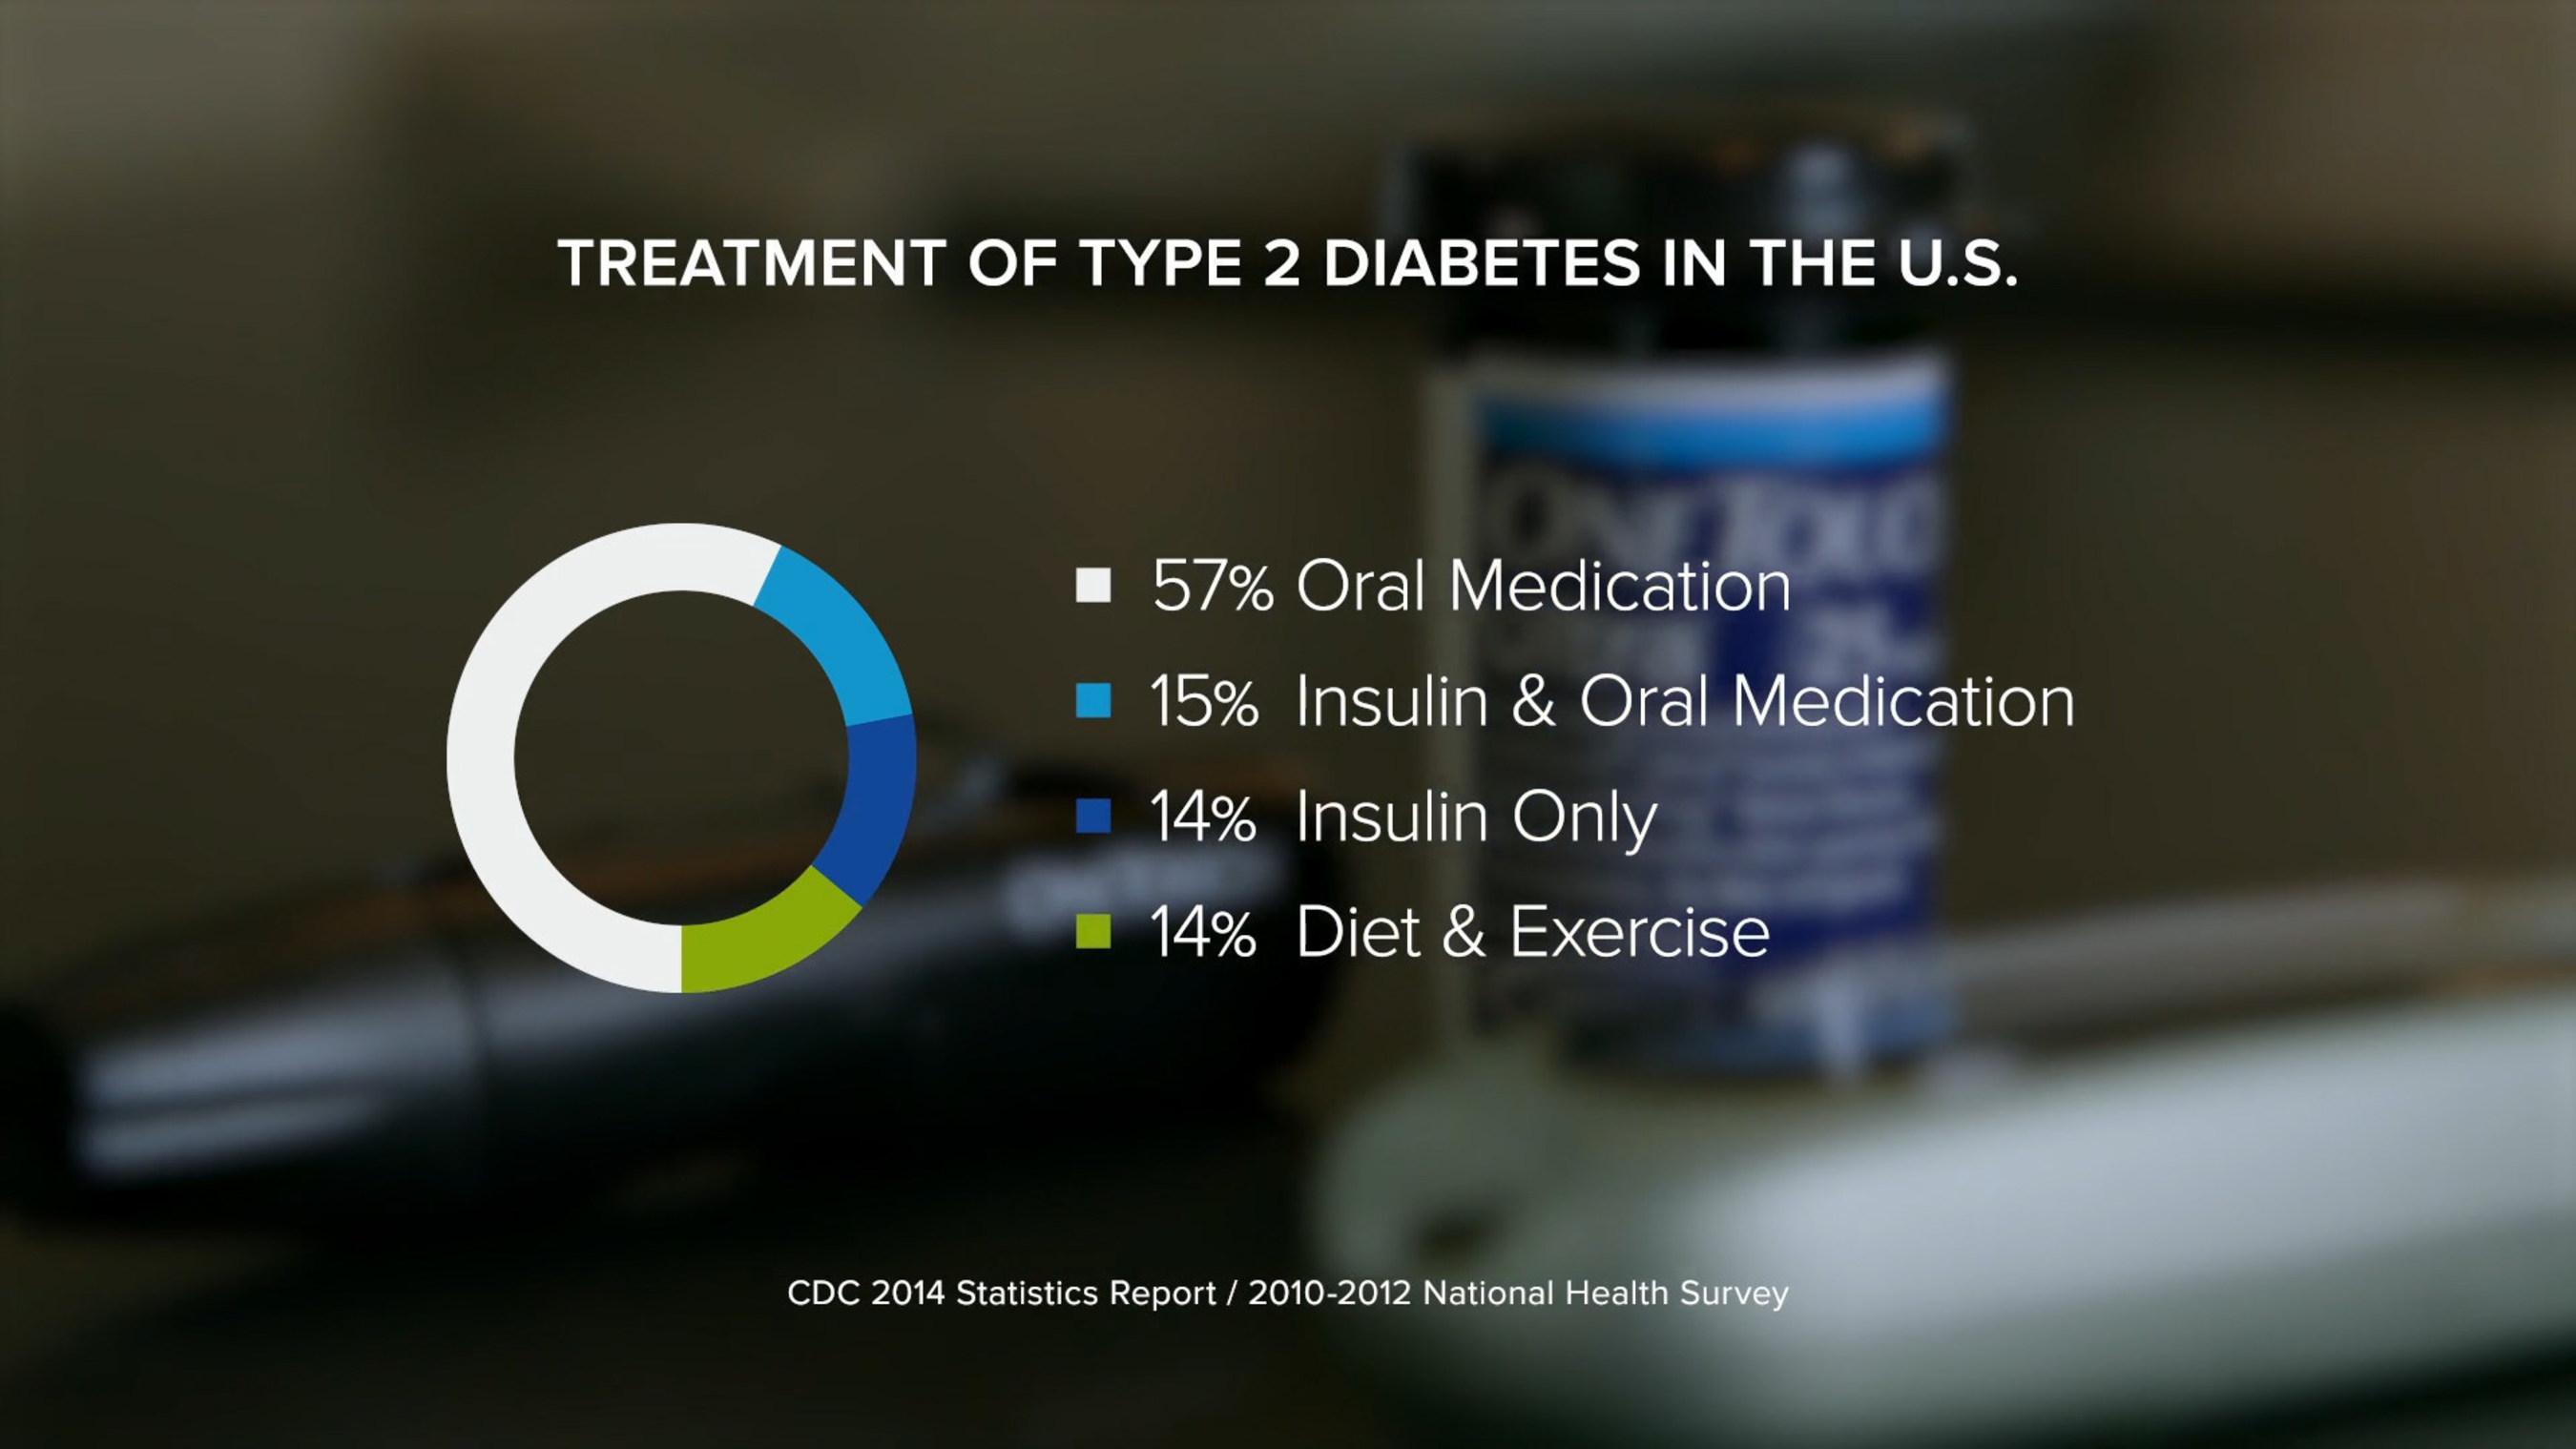 Treatment of Type 2 Diabetes Statistics from CDC 2014 Statistics Report